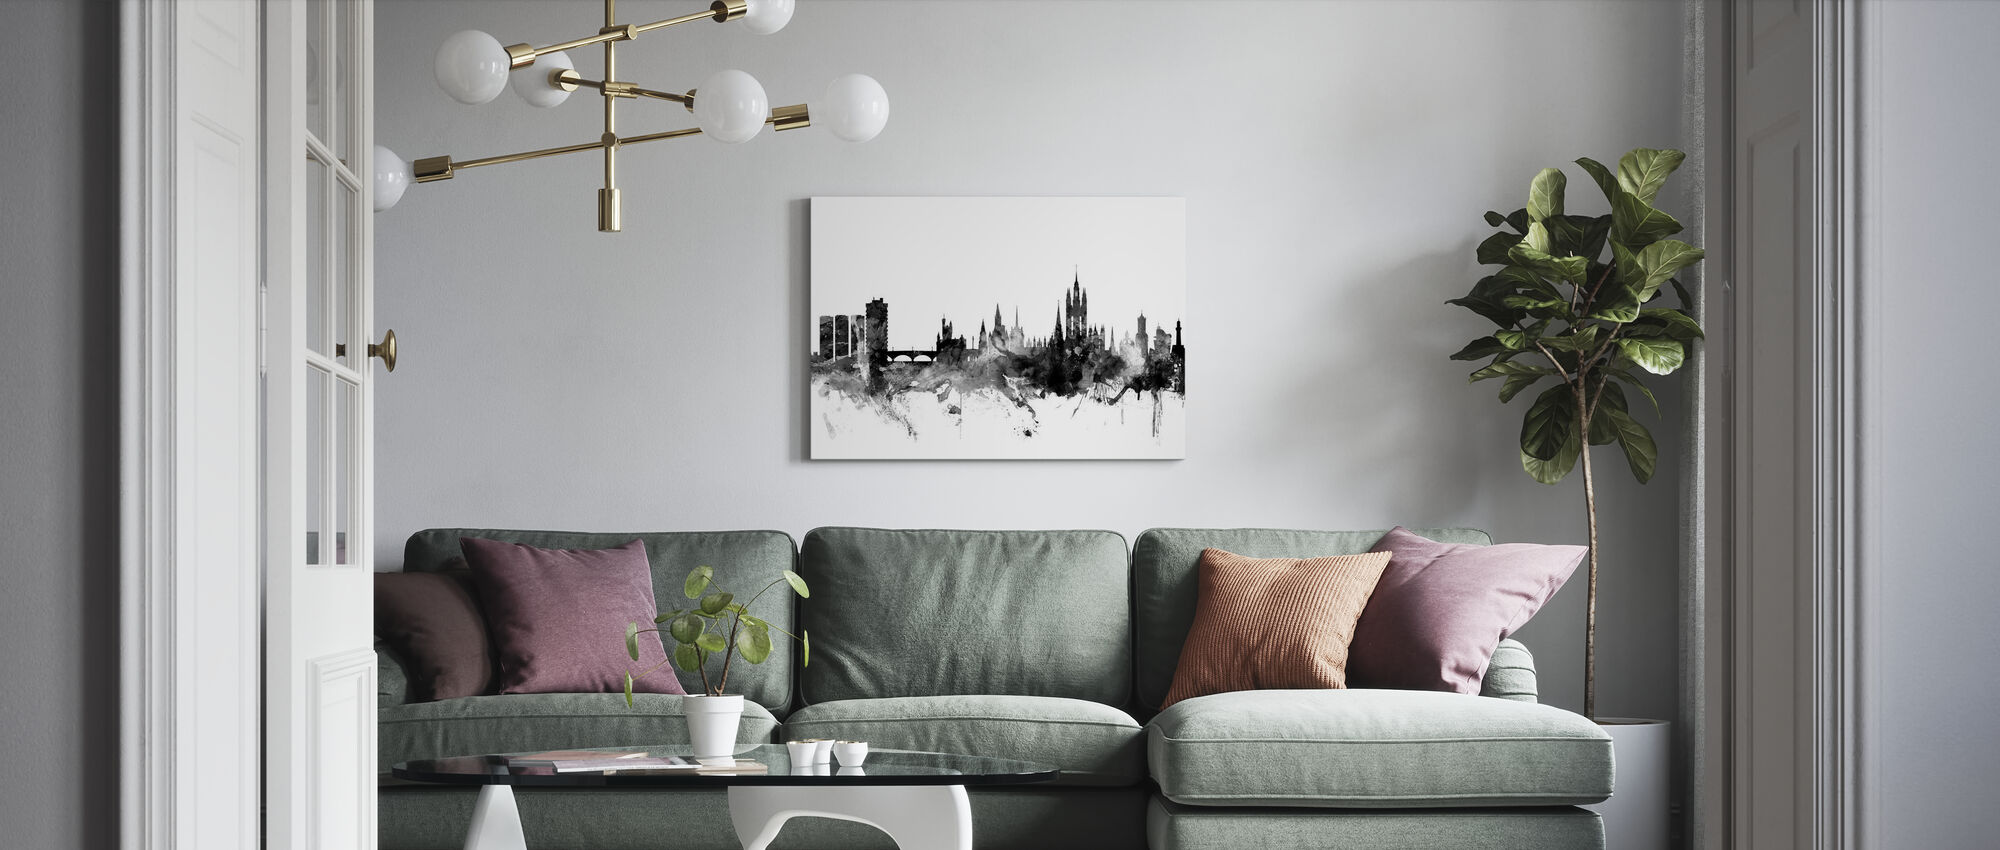 Aberdeen Scotland Skyline Black - Canvas print - Living Room